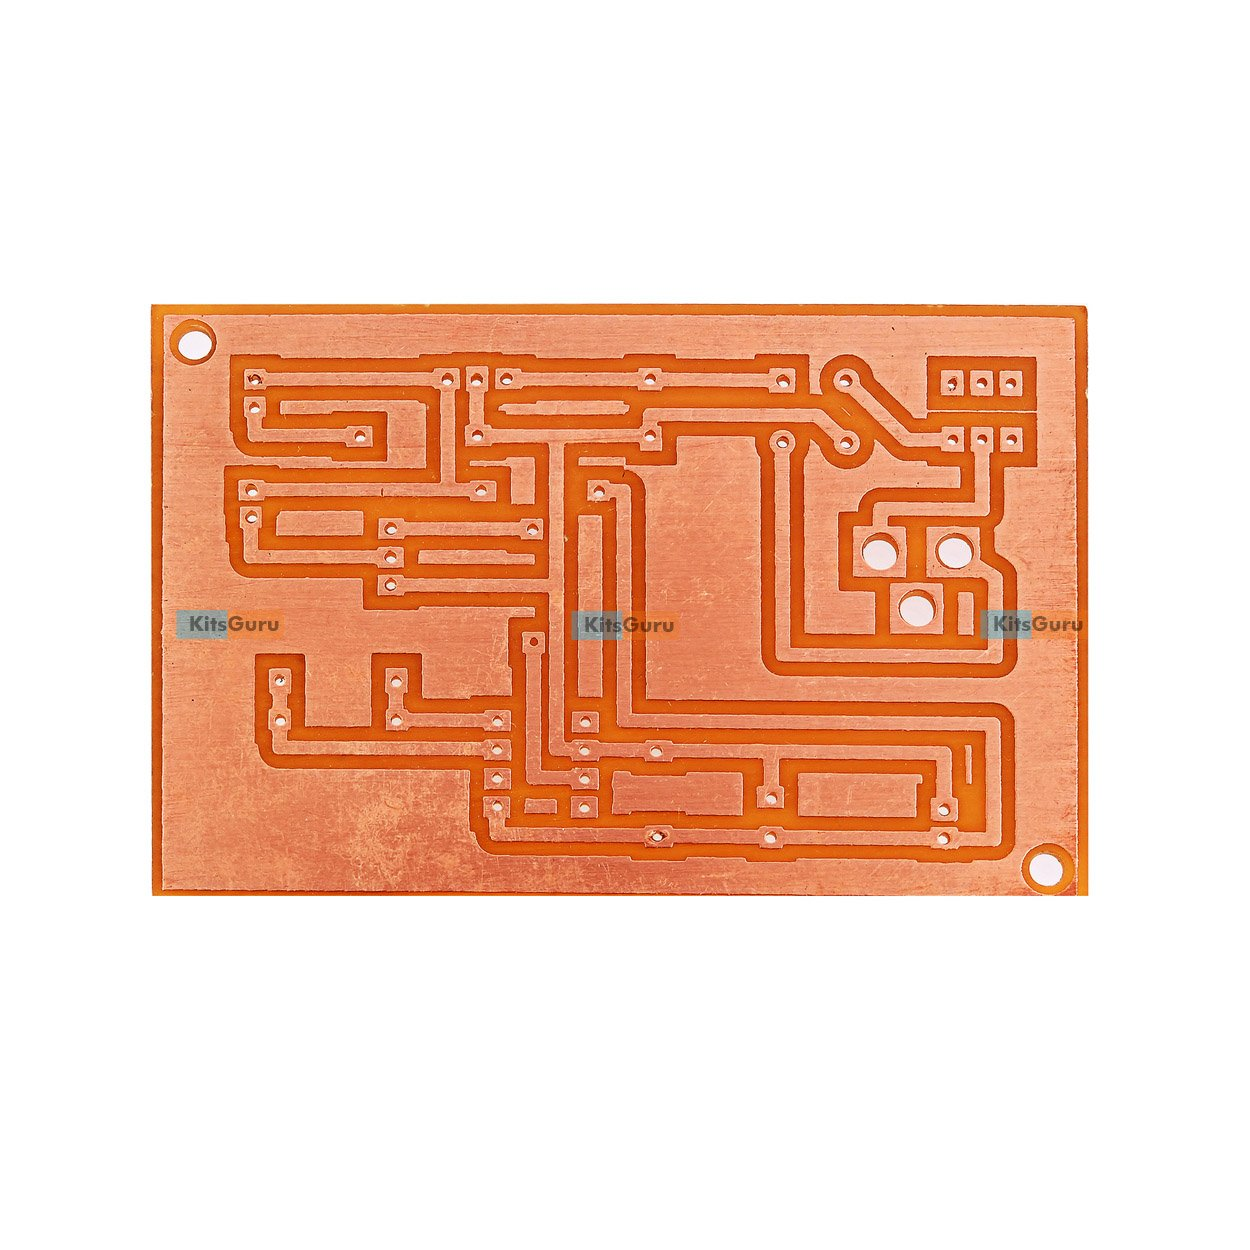 Diy Kit Atm Machine Gate Security System Lgkt001 Basic Multitone Siren Alarm Circuit Diagram Electronics